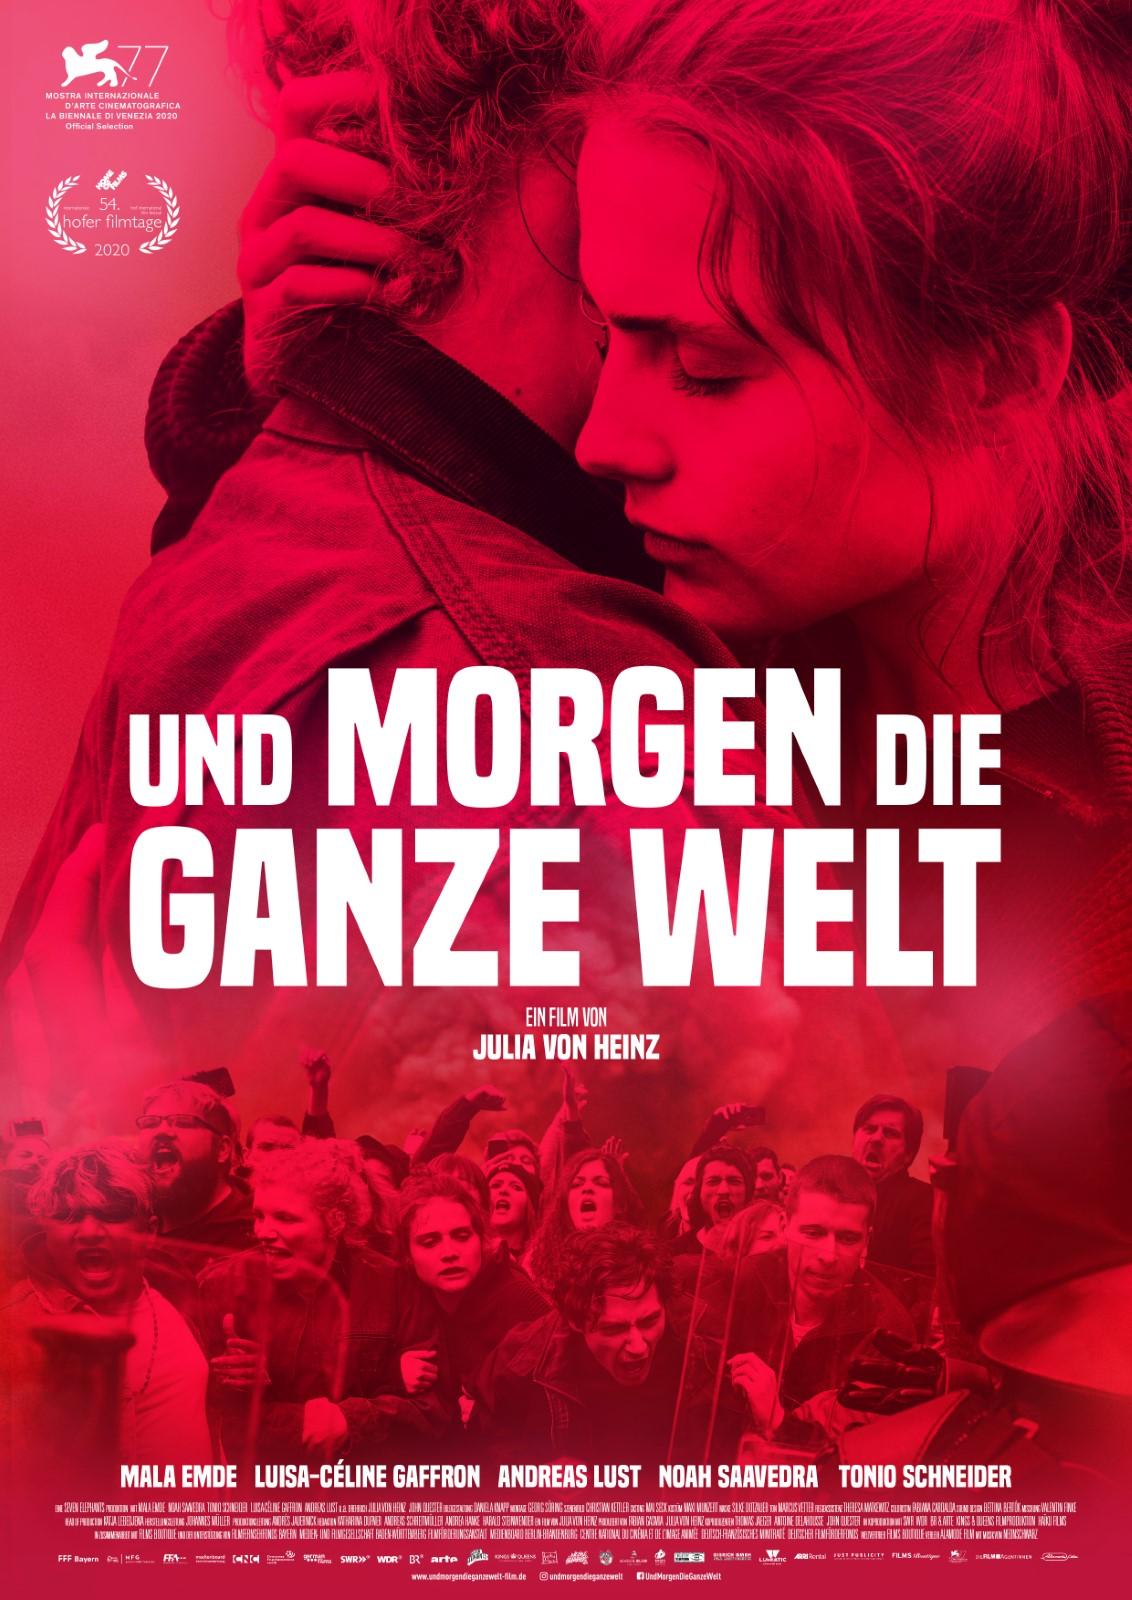 [好雷] 新歐洲計畫 Je suis Karl (Netflix 德國&捷克)